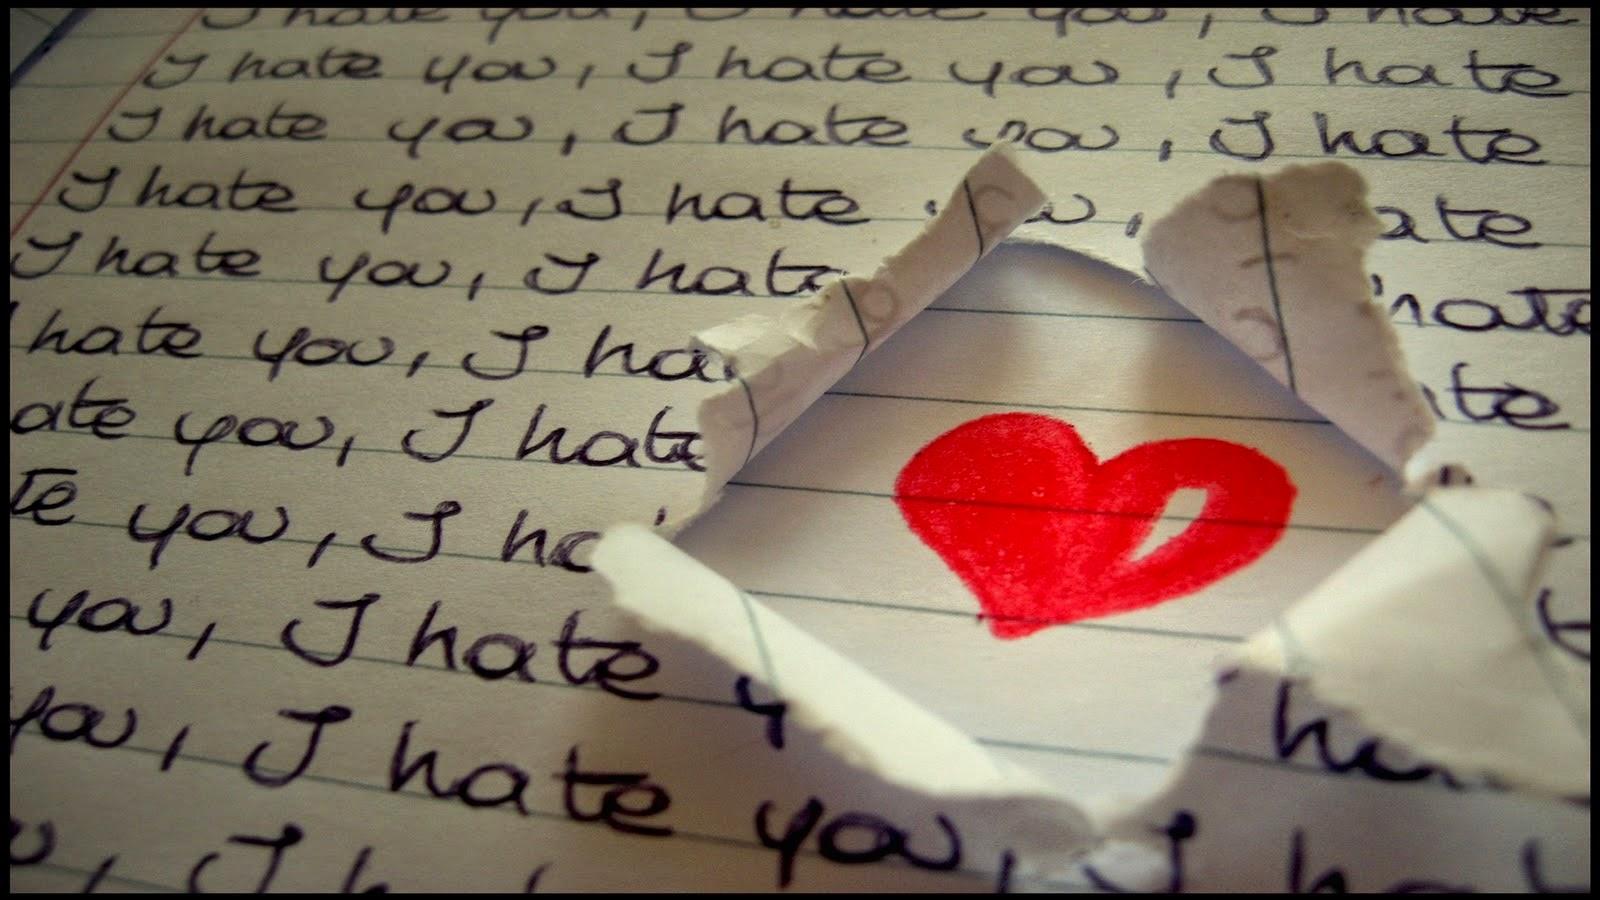 Imágenes Con Frases Chidas Para Celular De Amor Románticas: Imagenes Chidas De Todo Tipo, Amor, Carros Animadas Con